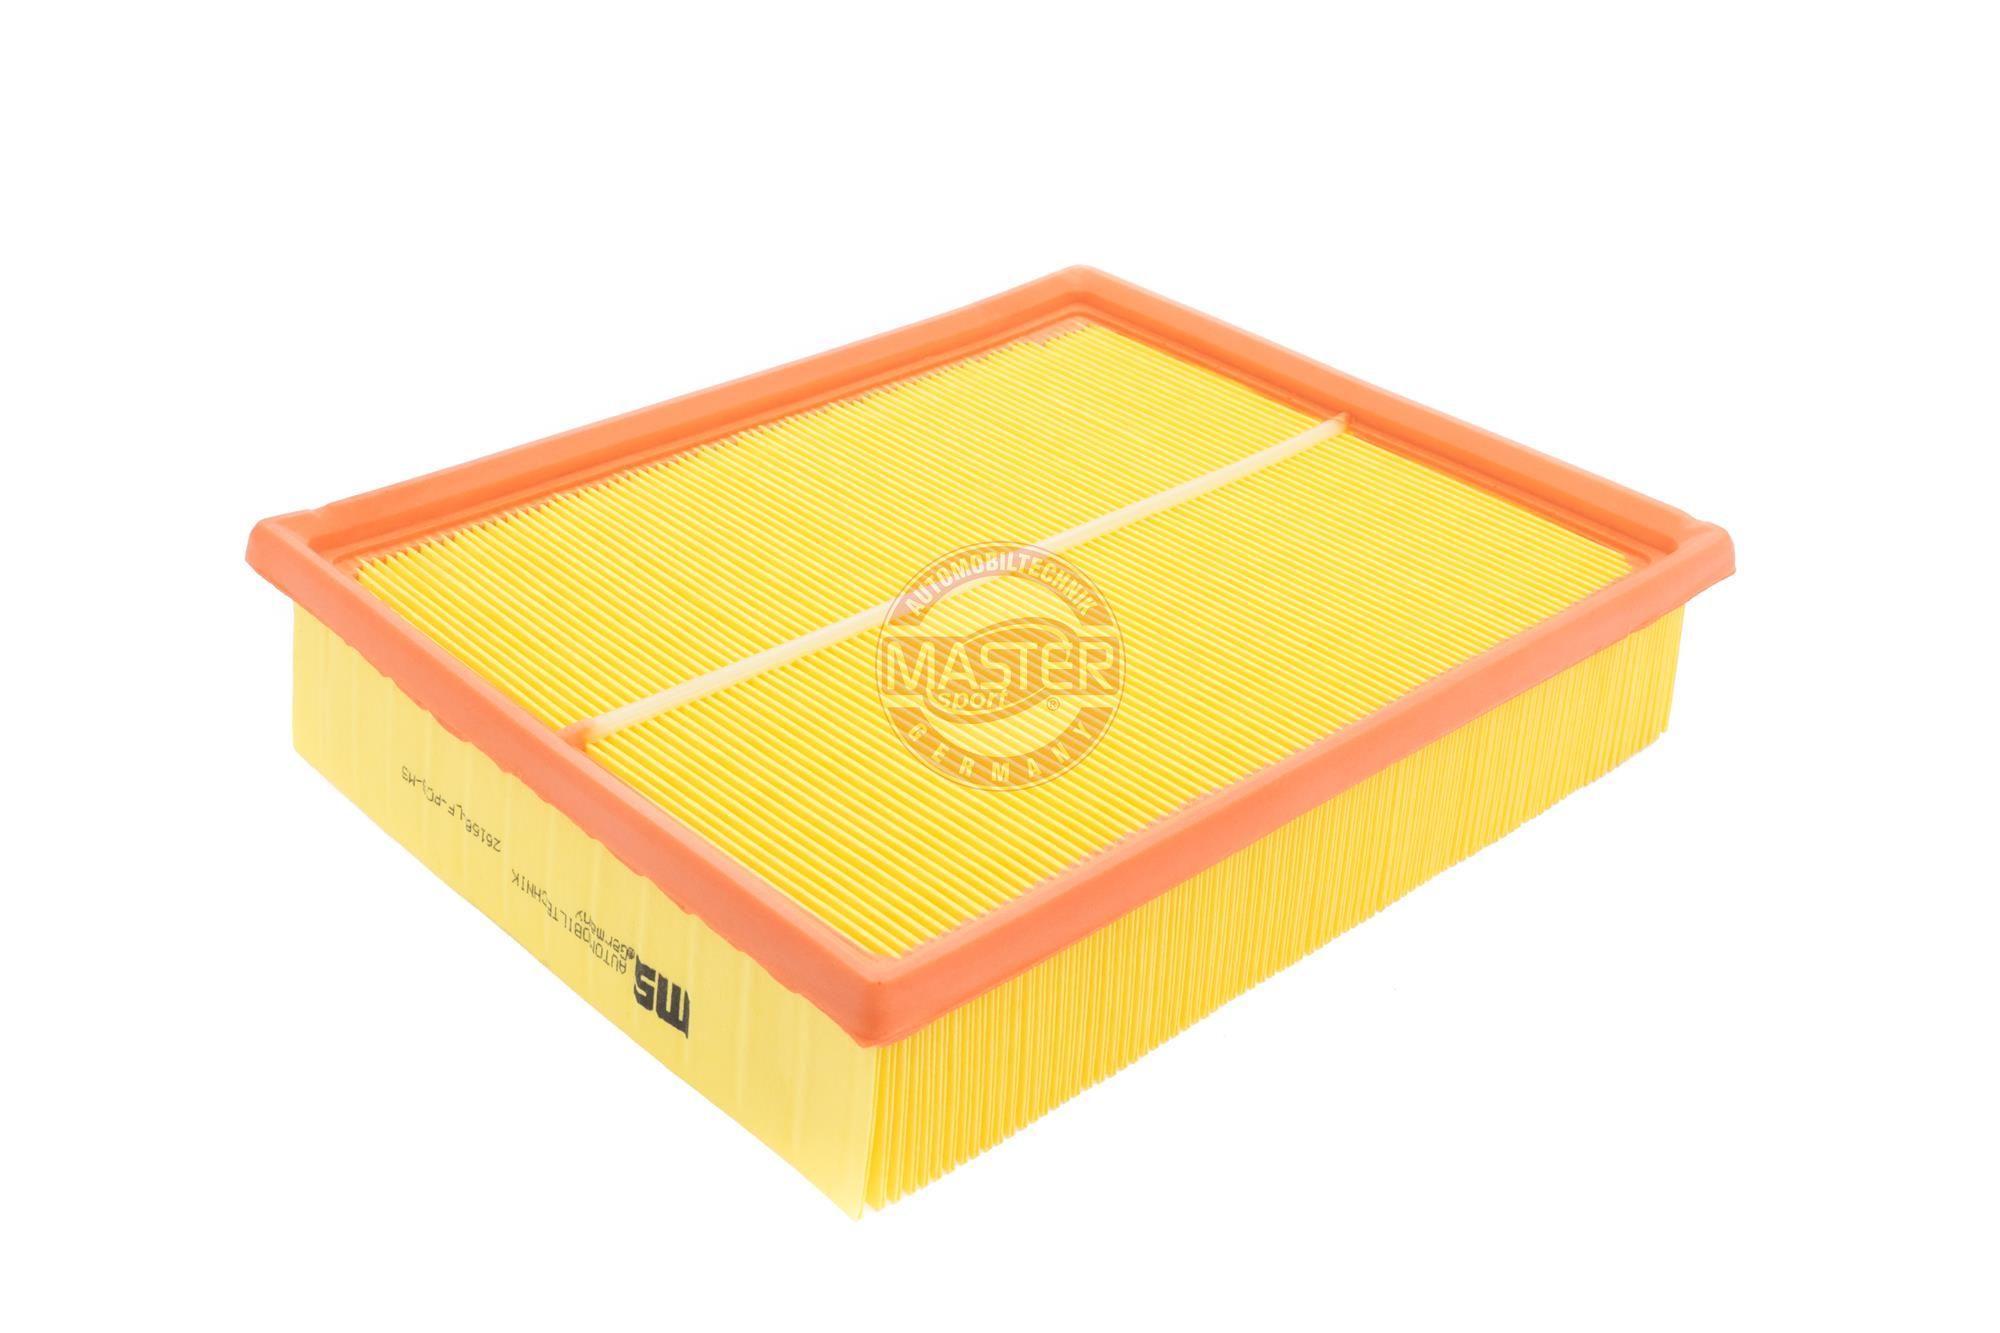 AUDI A6 2016 Luftfilter - Original MASTER-SPORT 26168-LF-PCS-MS Länge: 252mm, Länge: 252mm, Breite: 211mm, Höhe: 57mm